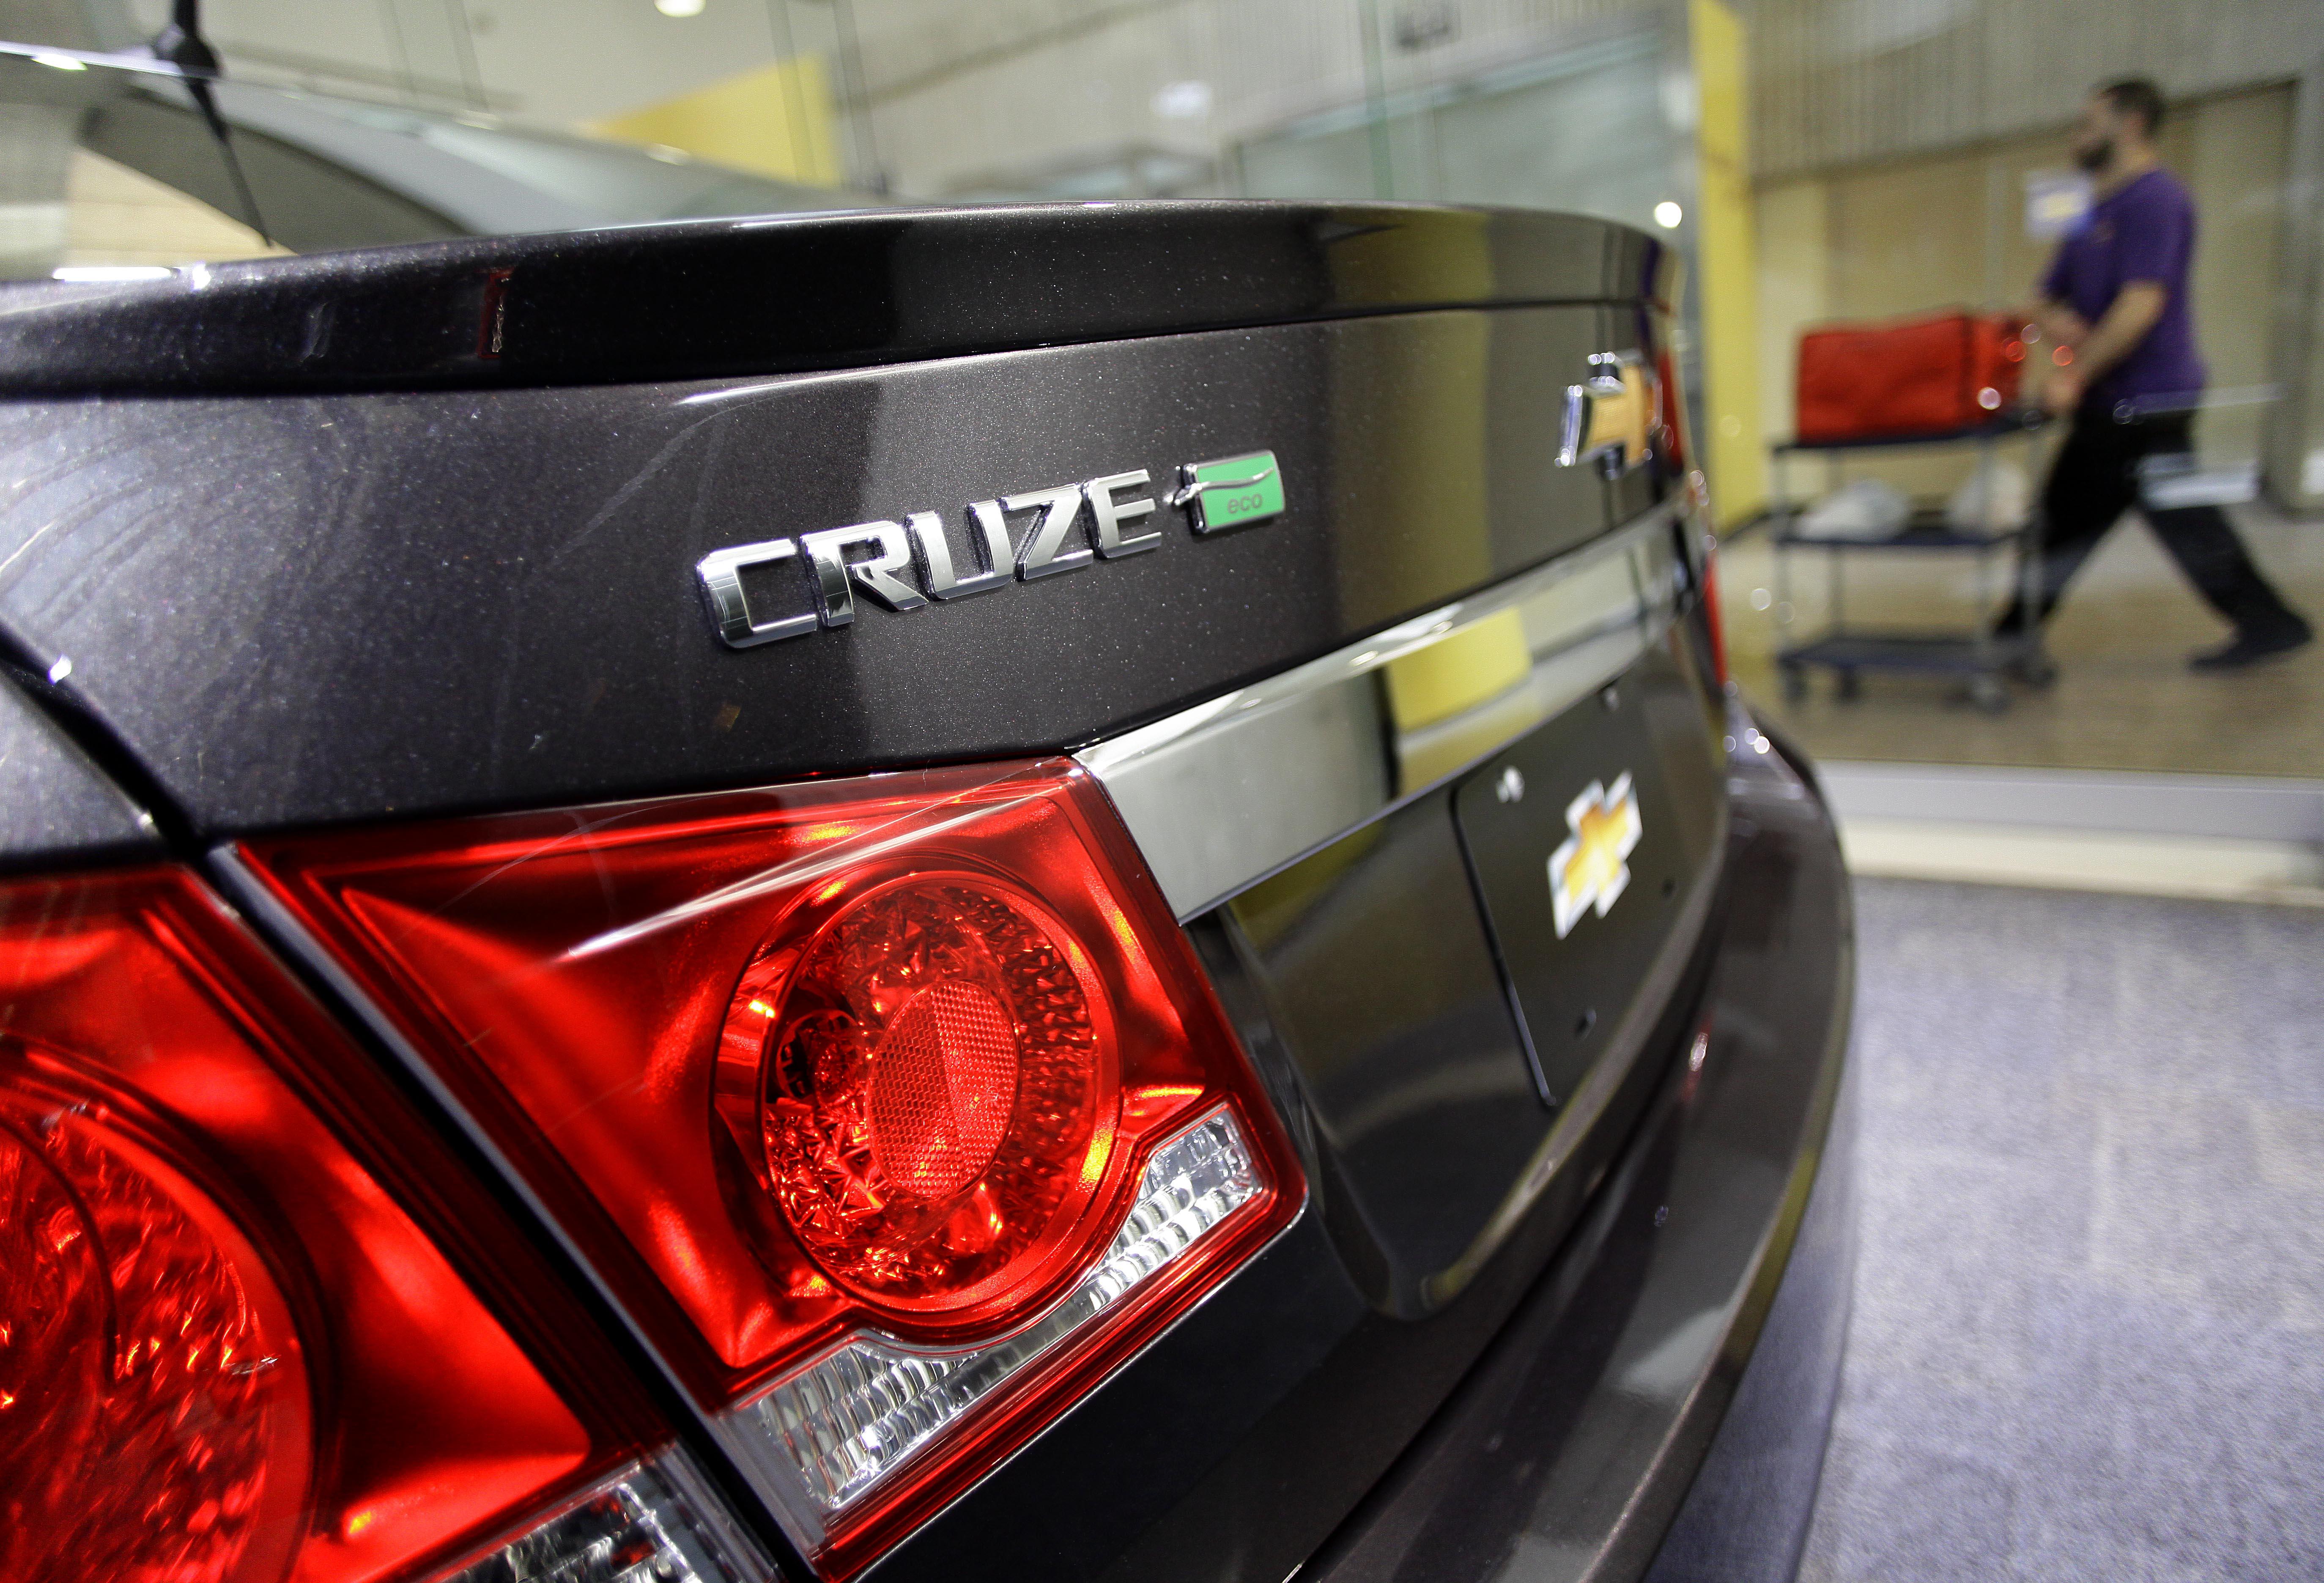 A man walks past a Chevrolet Cruze Eco displayed at the General Motors headquarters April 1, 2014 in Detroit, Michigan.